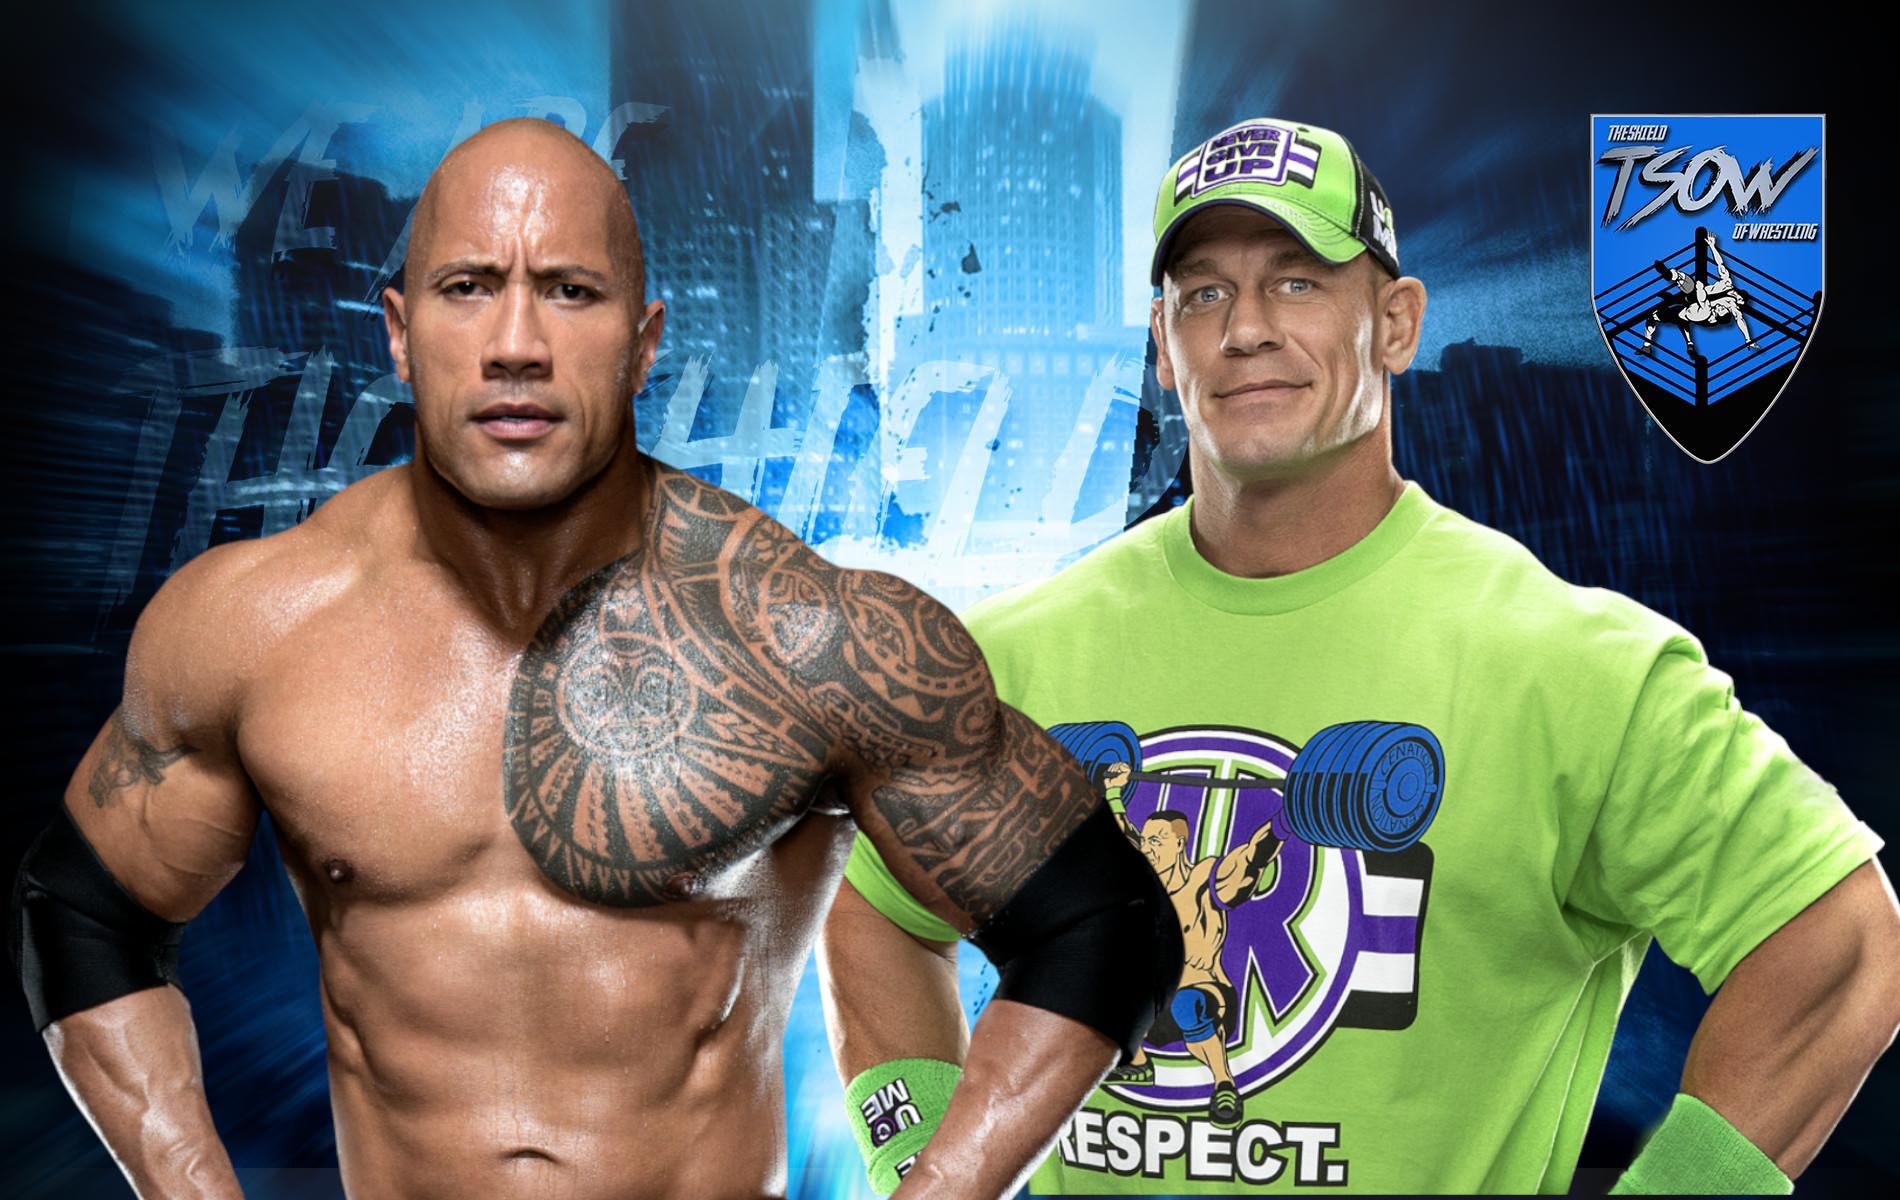 John Cena affronterà The Rock in un futuro Fast And Furious?